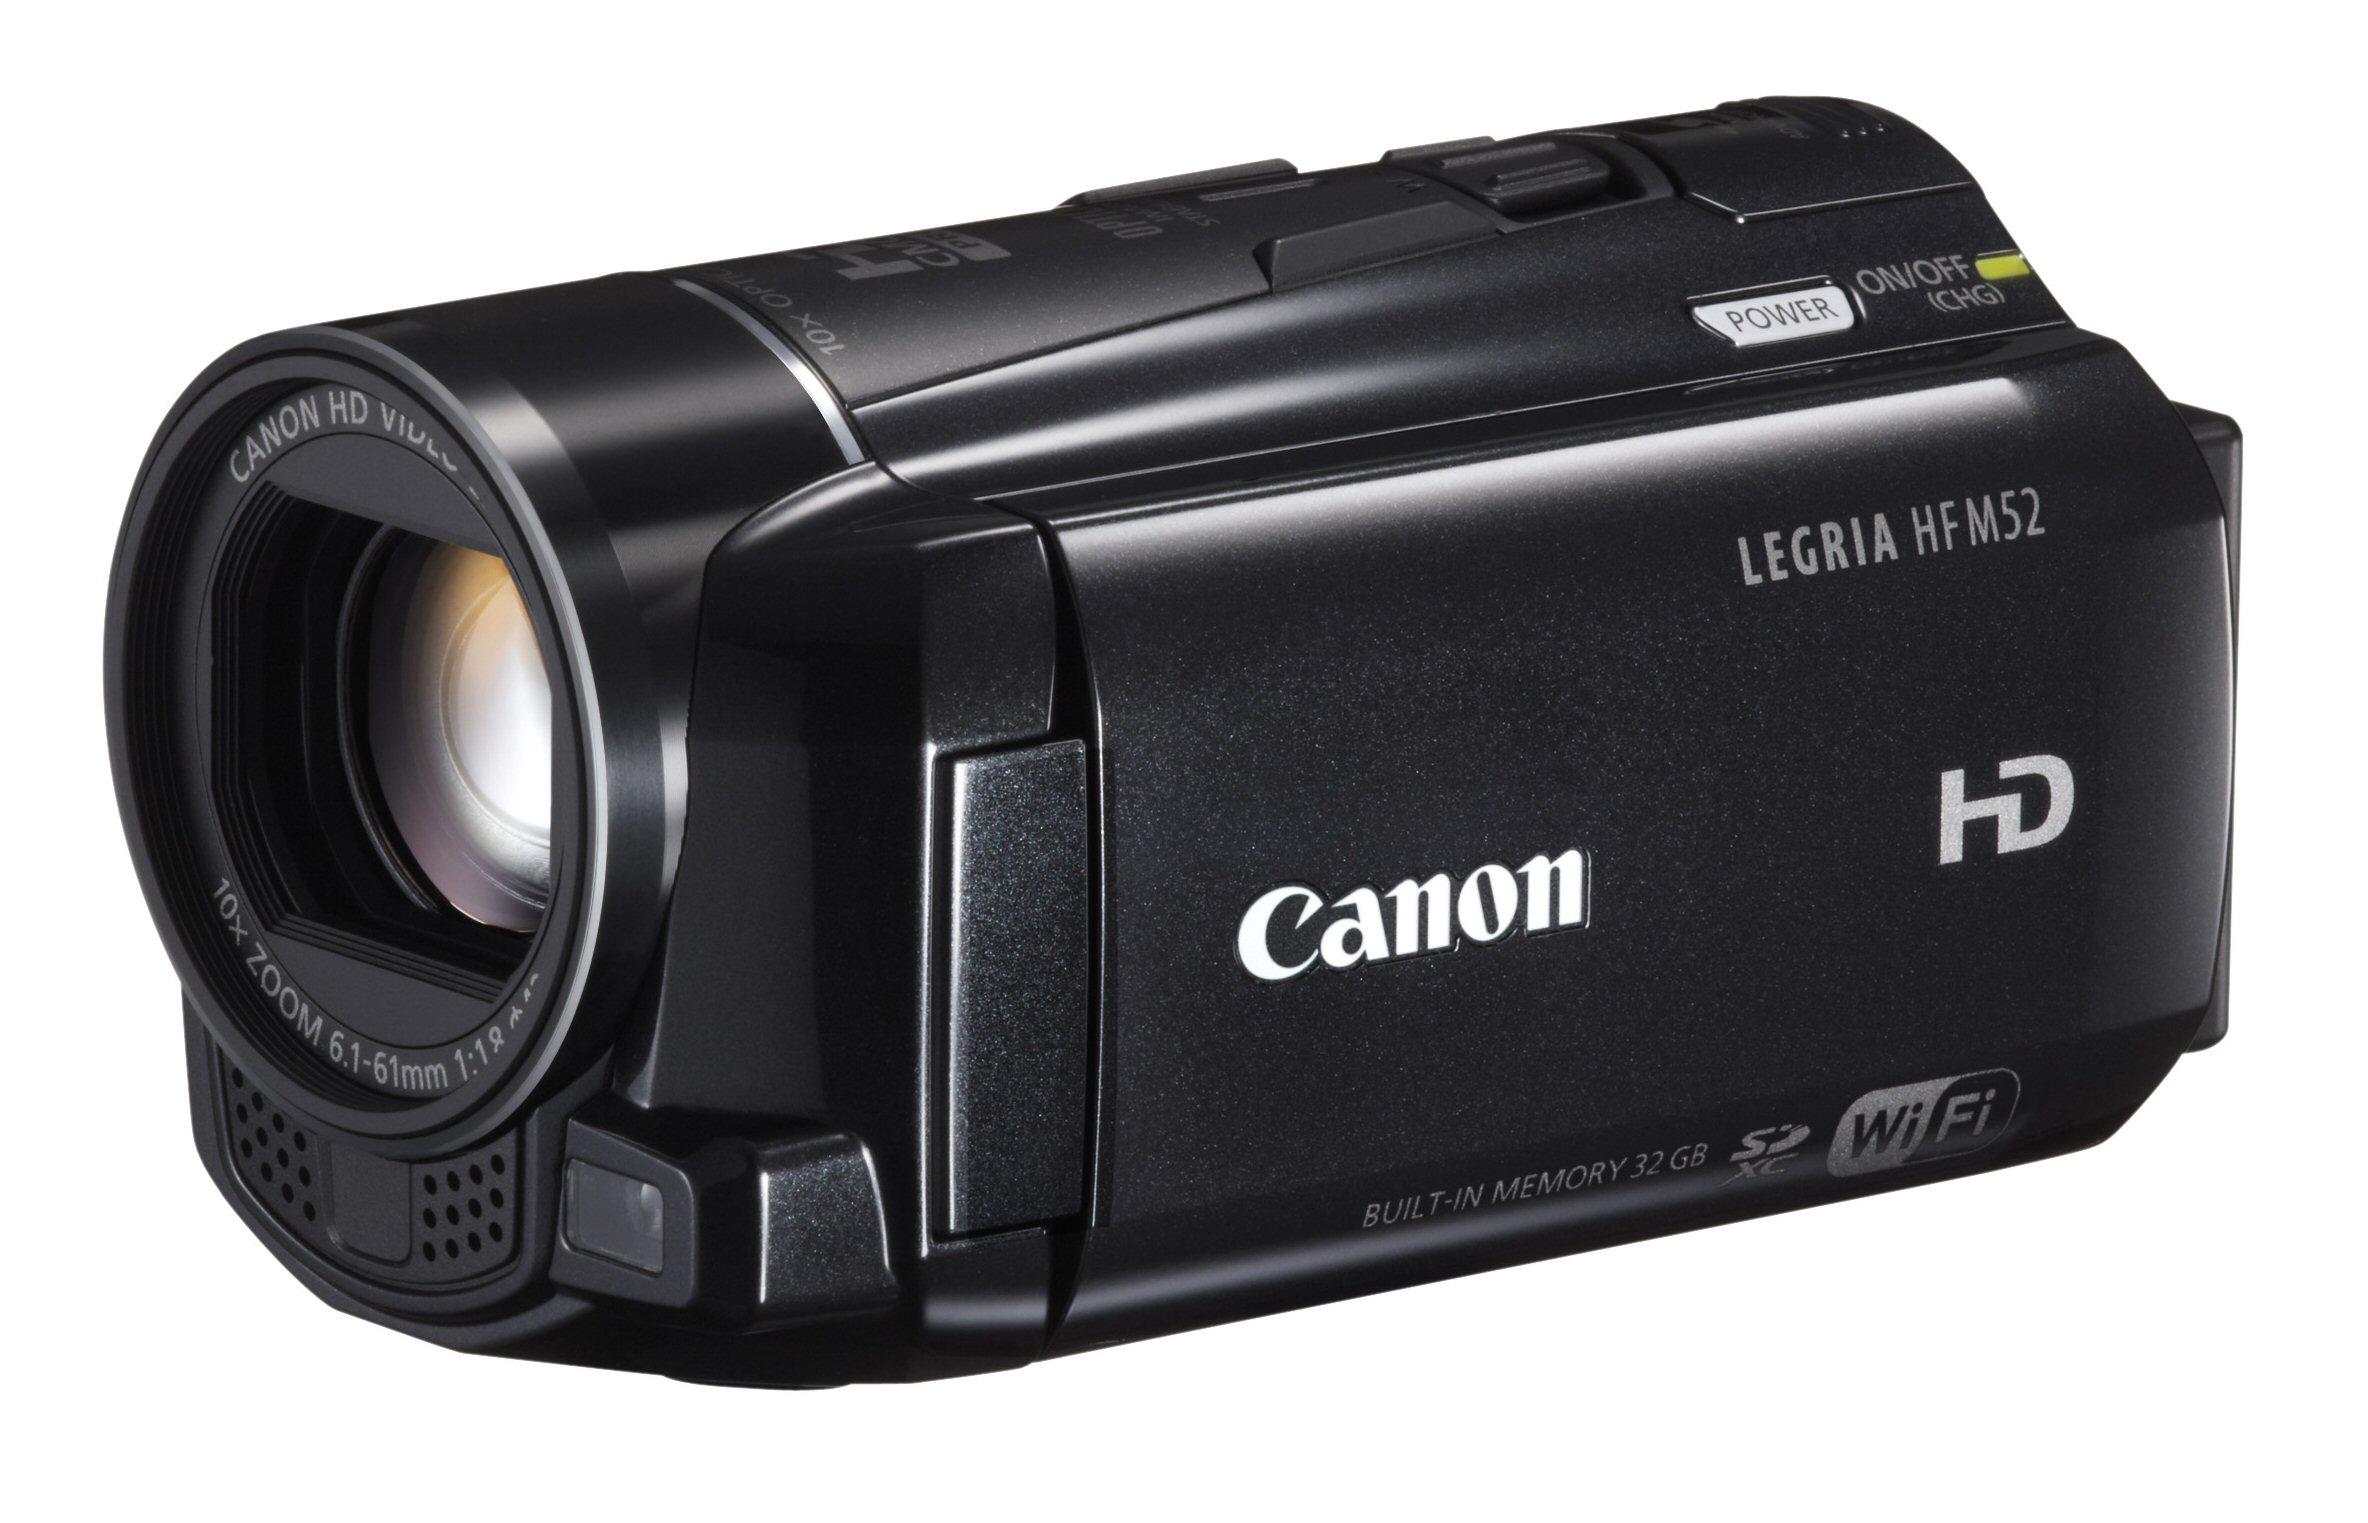 Canons Legria HF M52